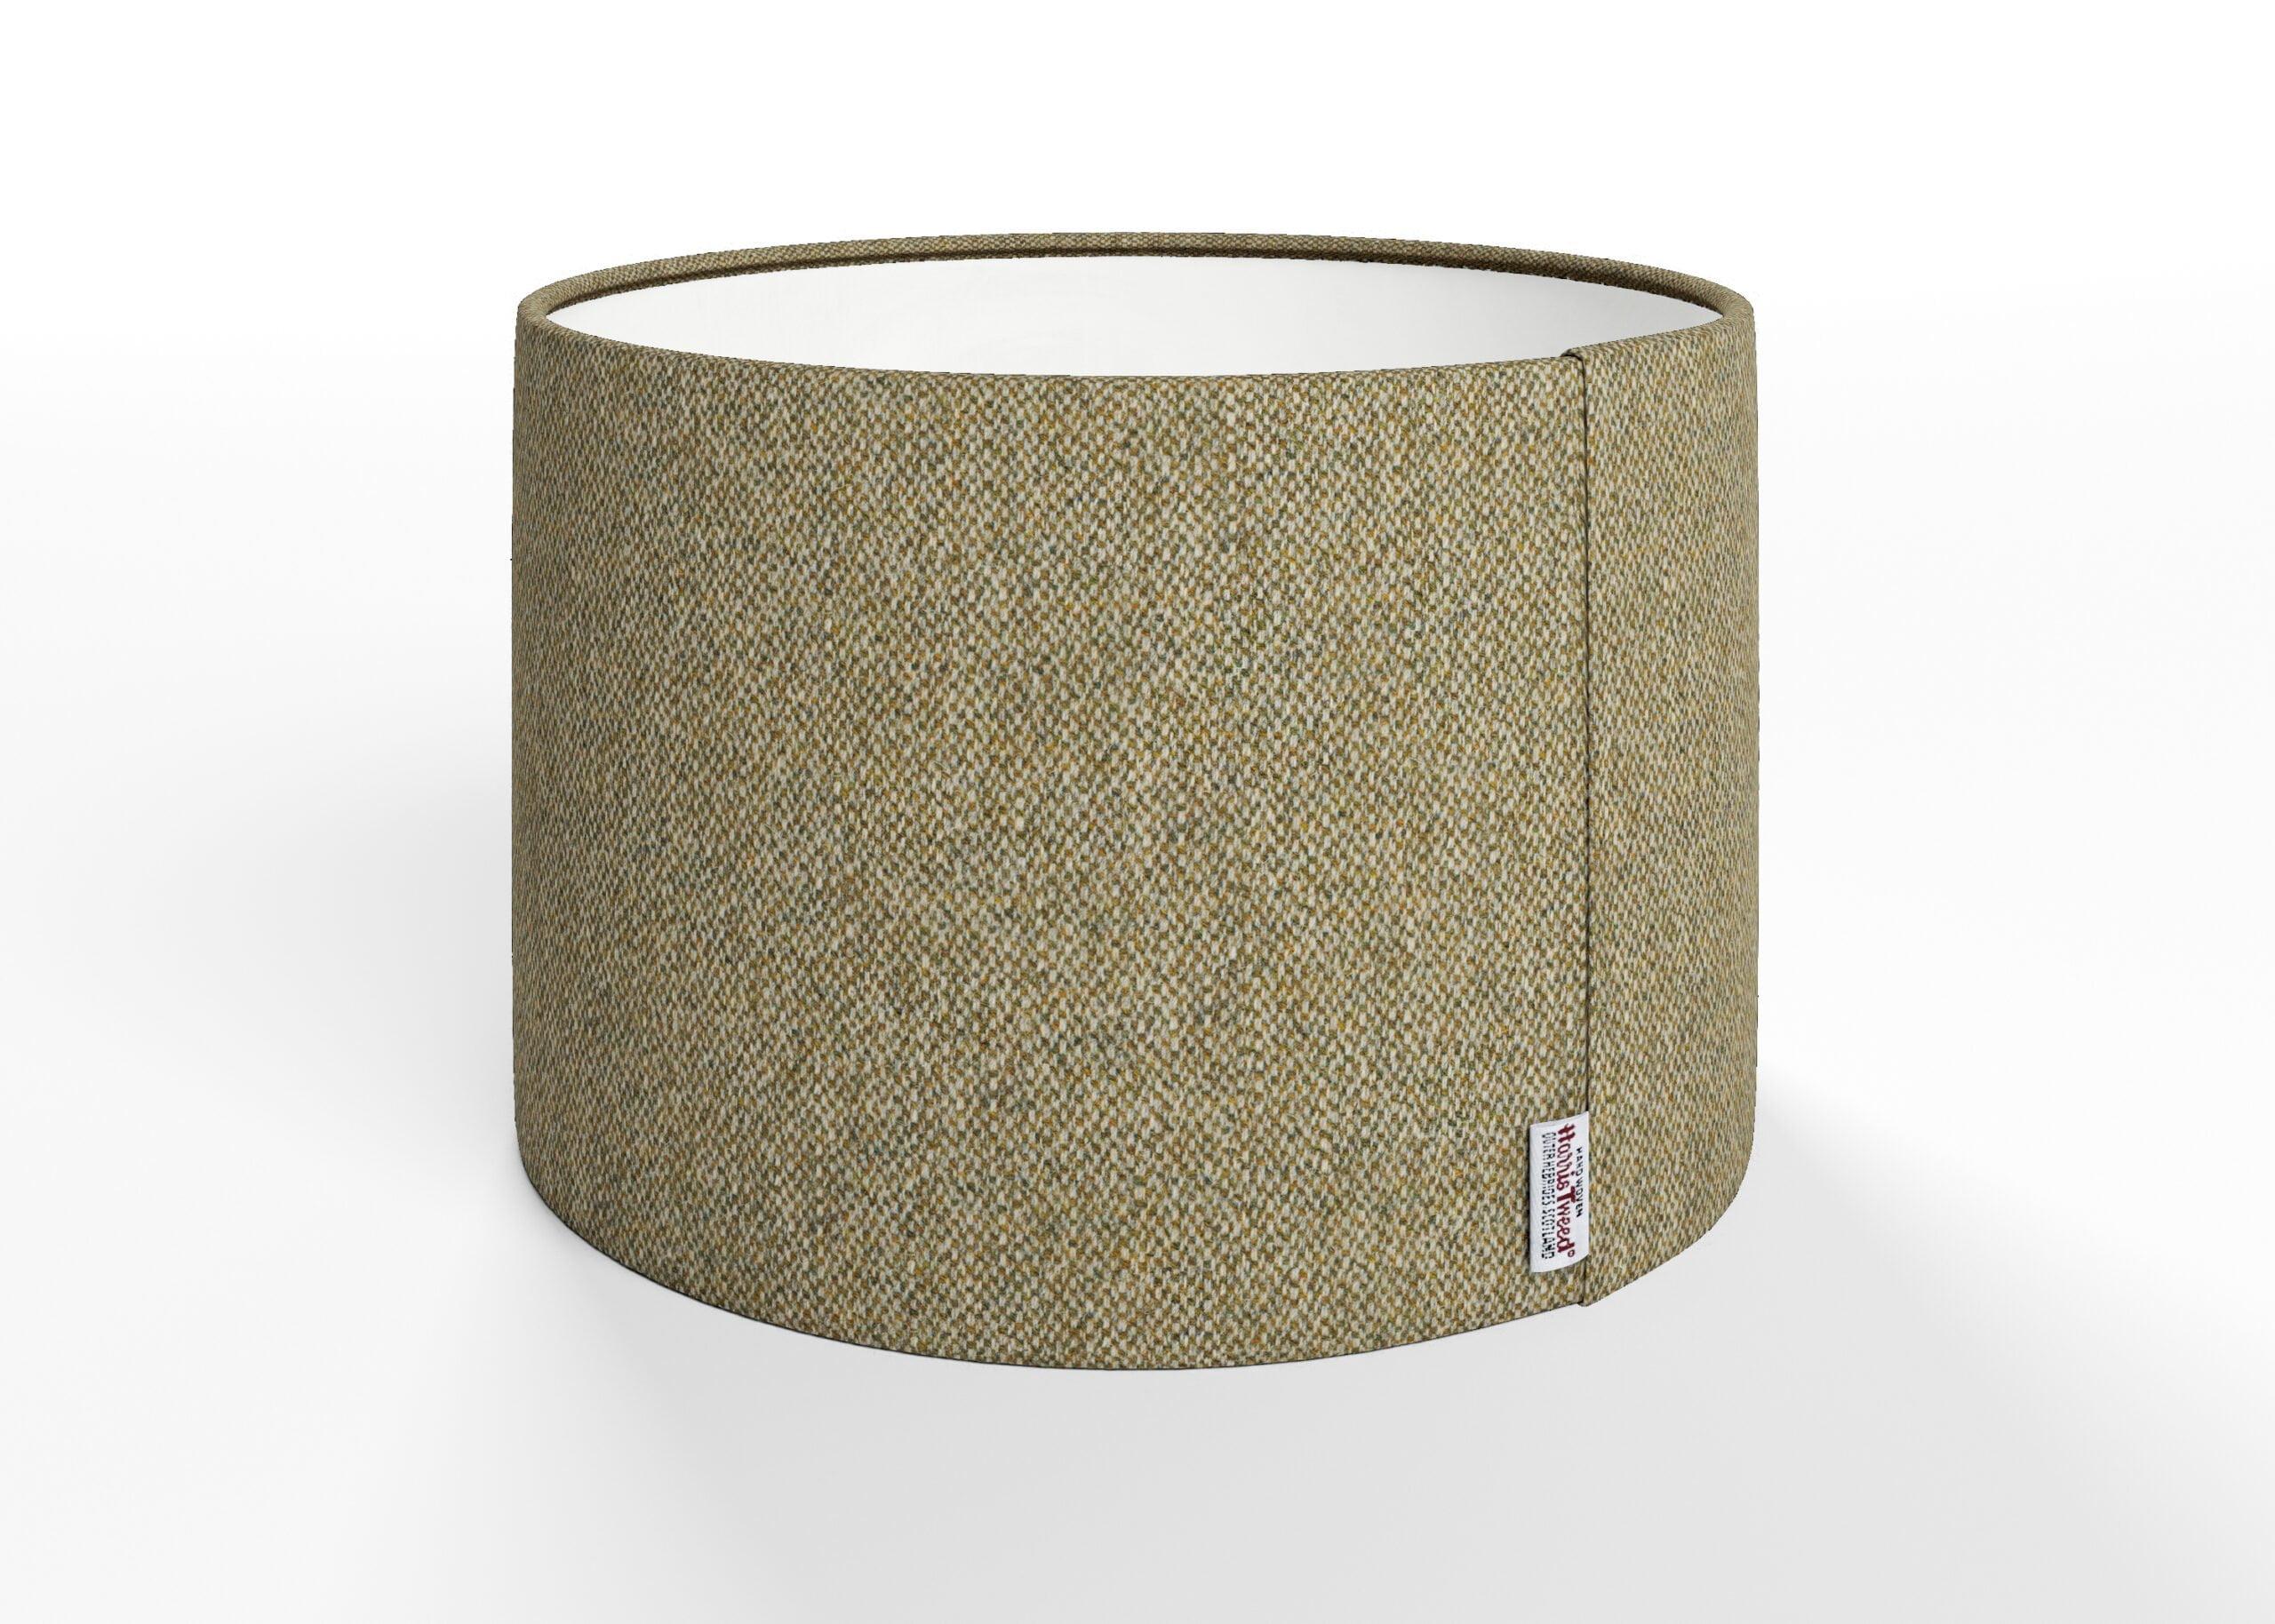 harris tweed lampshade, earth green lampshade